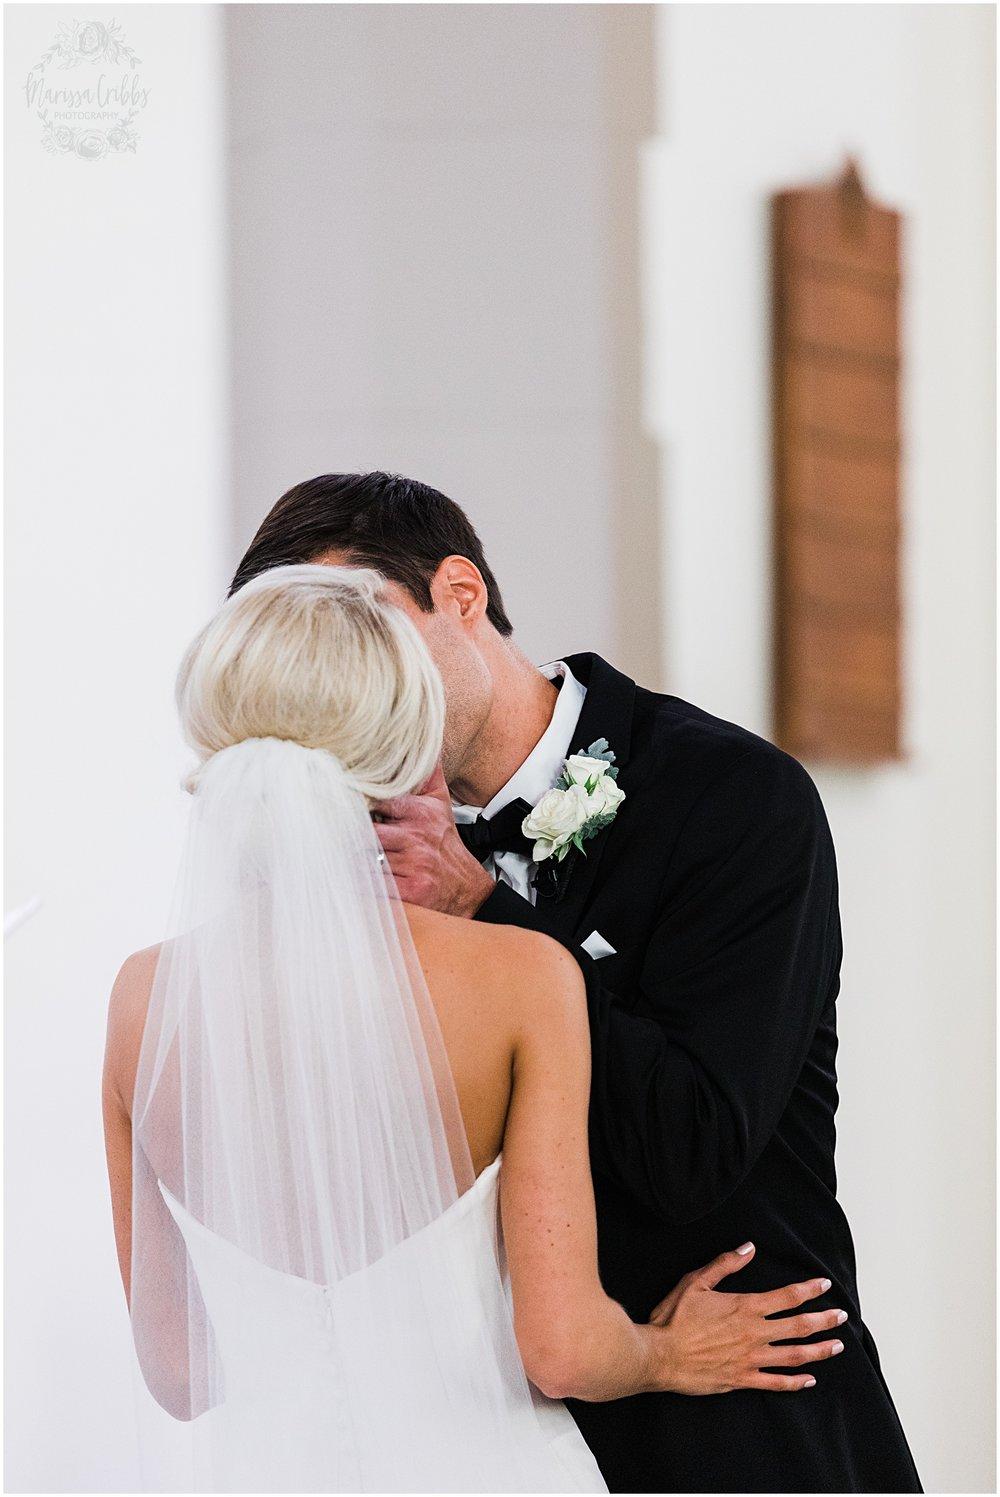 NOLL WEDDING | THE BRASS ON BALTIMORE | MARISSA CRIBBS PHOTOGRAPHY_6286.jpg